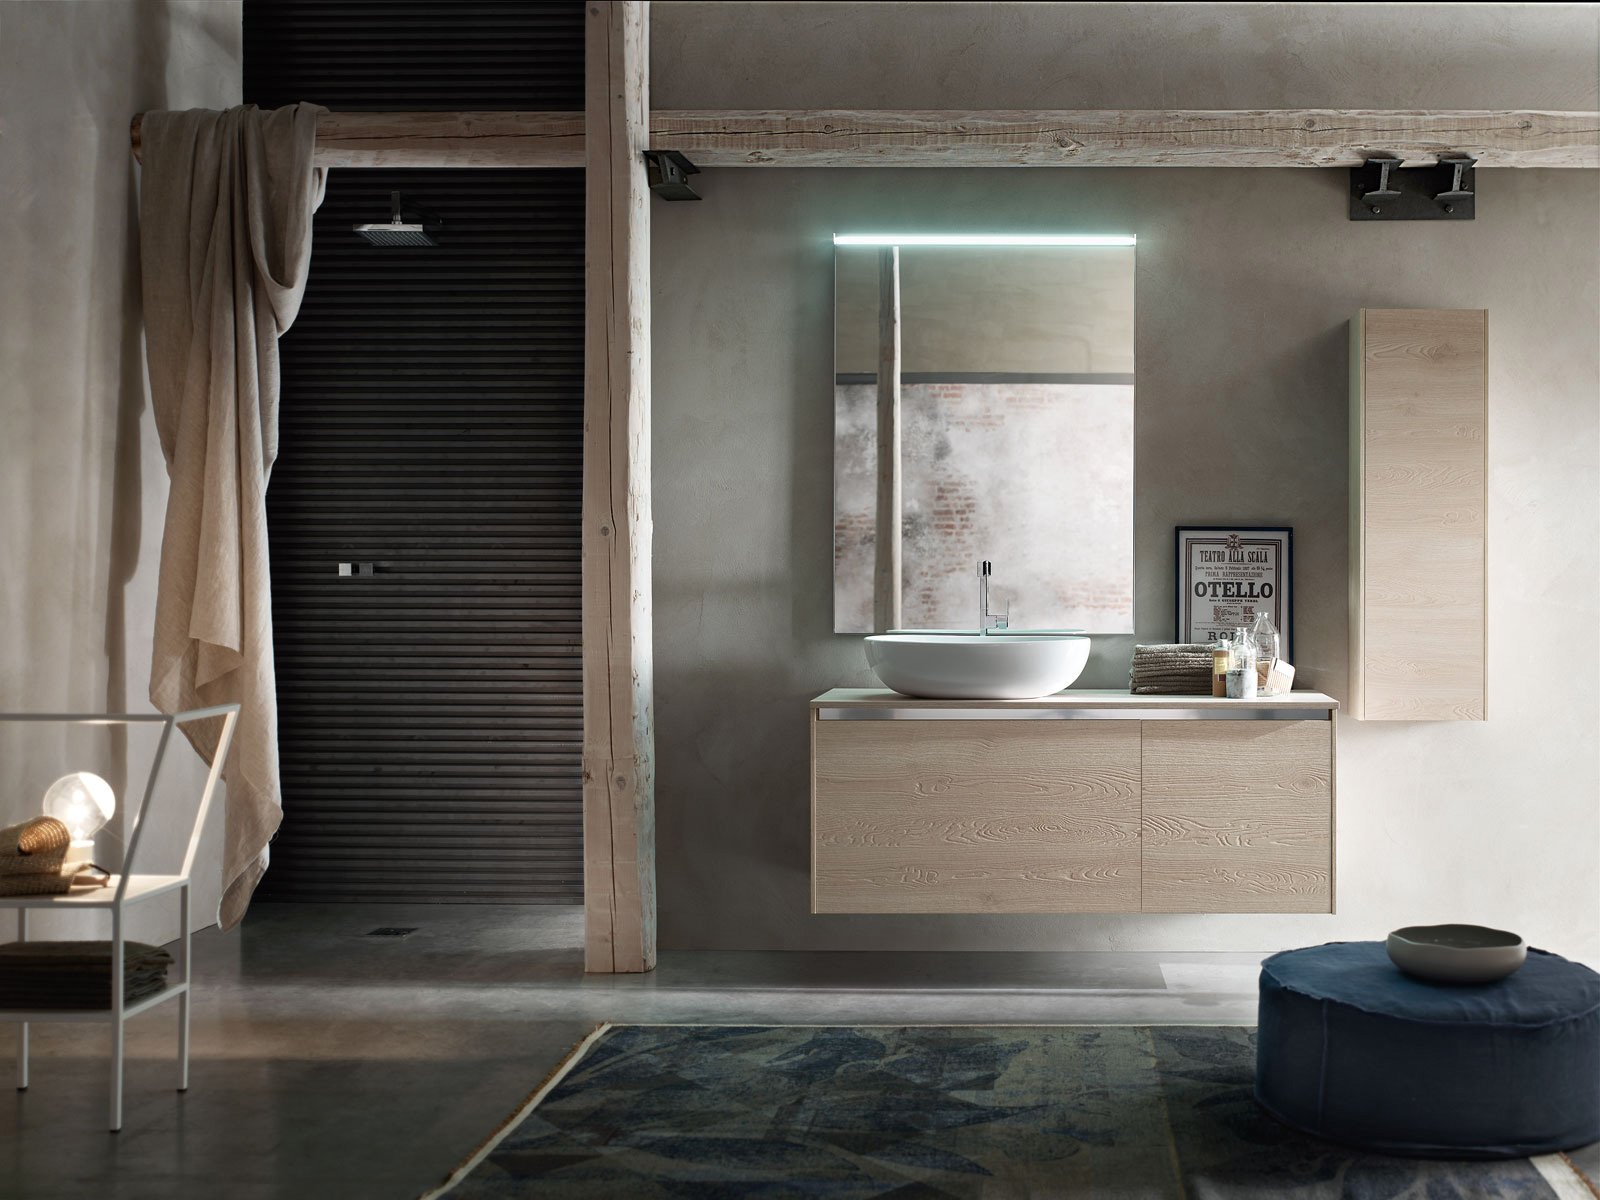 Design resistenza per l 39 arredo bagno di arcom cose di casa for Arcom bagno